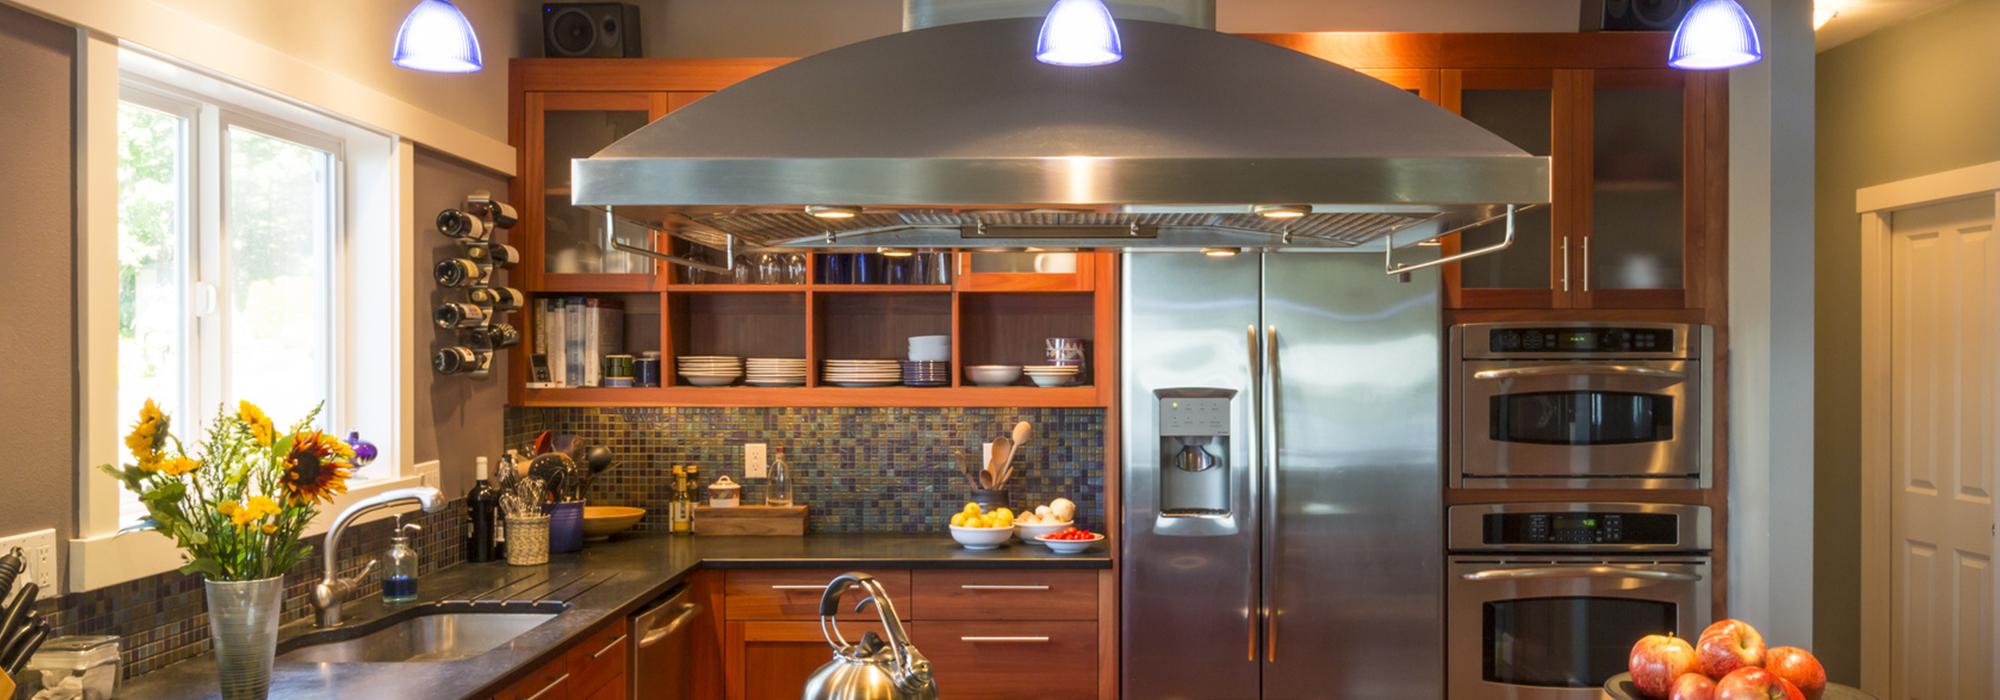 Elettrodomestici utili in cucina cucine padova - Elettrodomestici in cucina ...